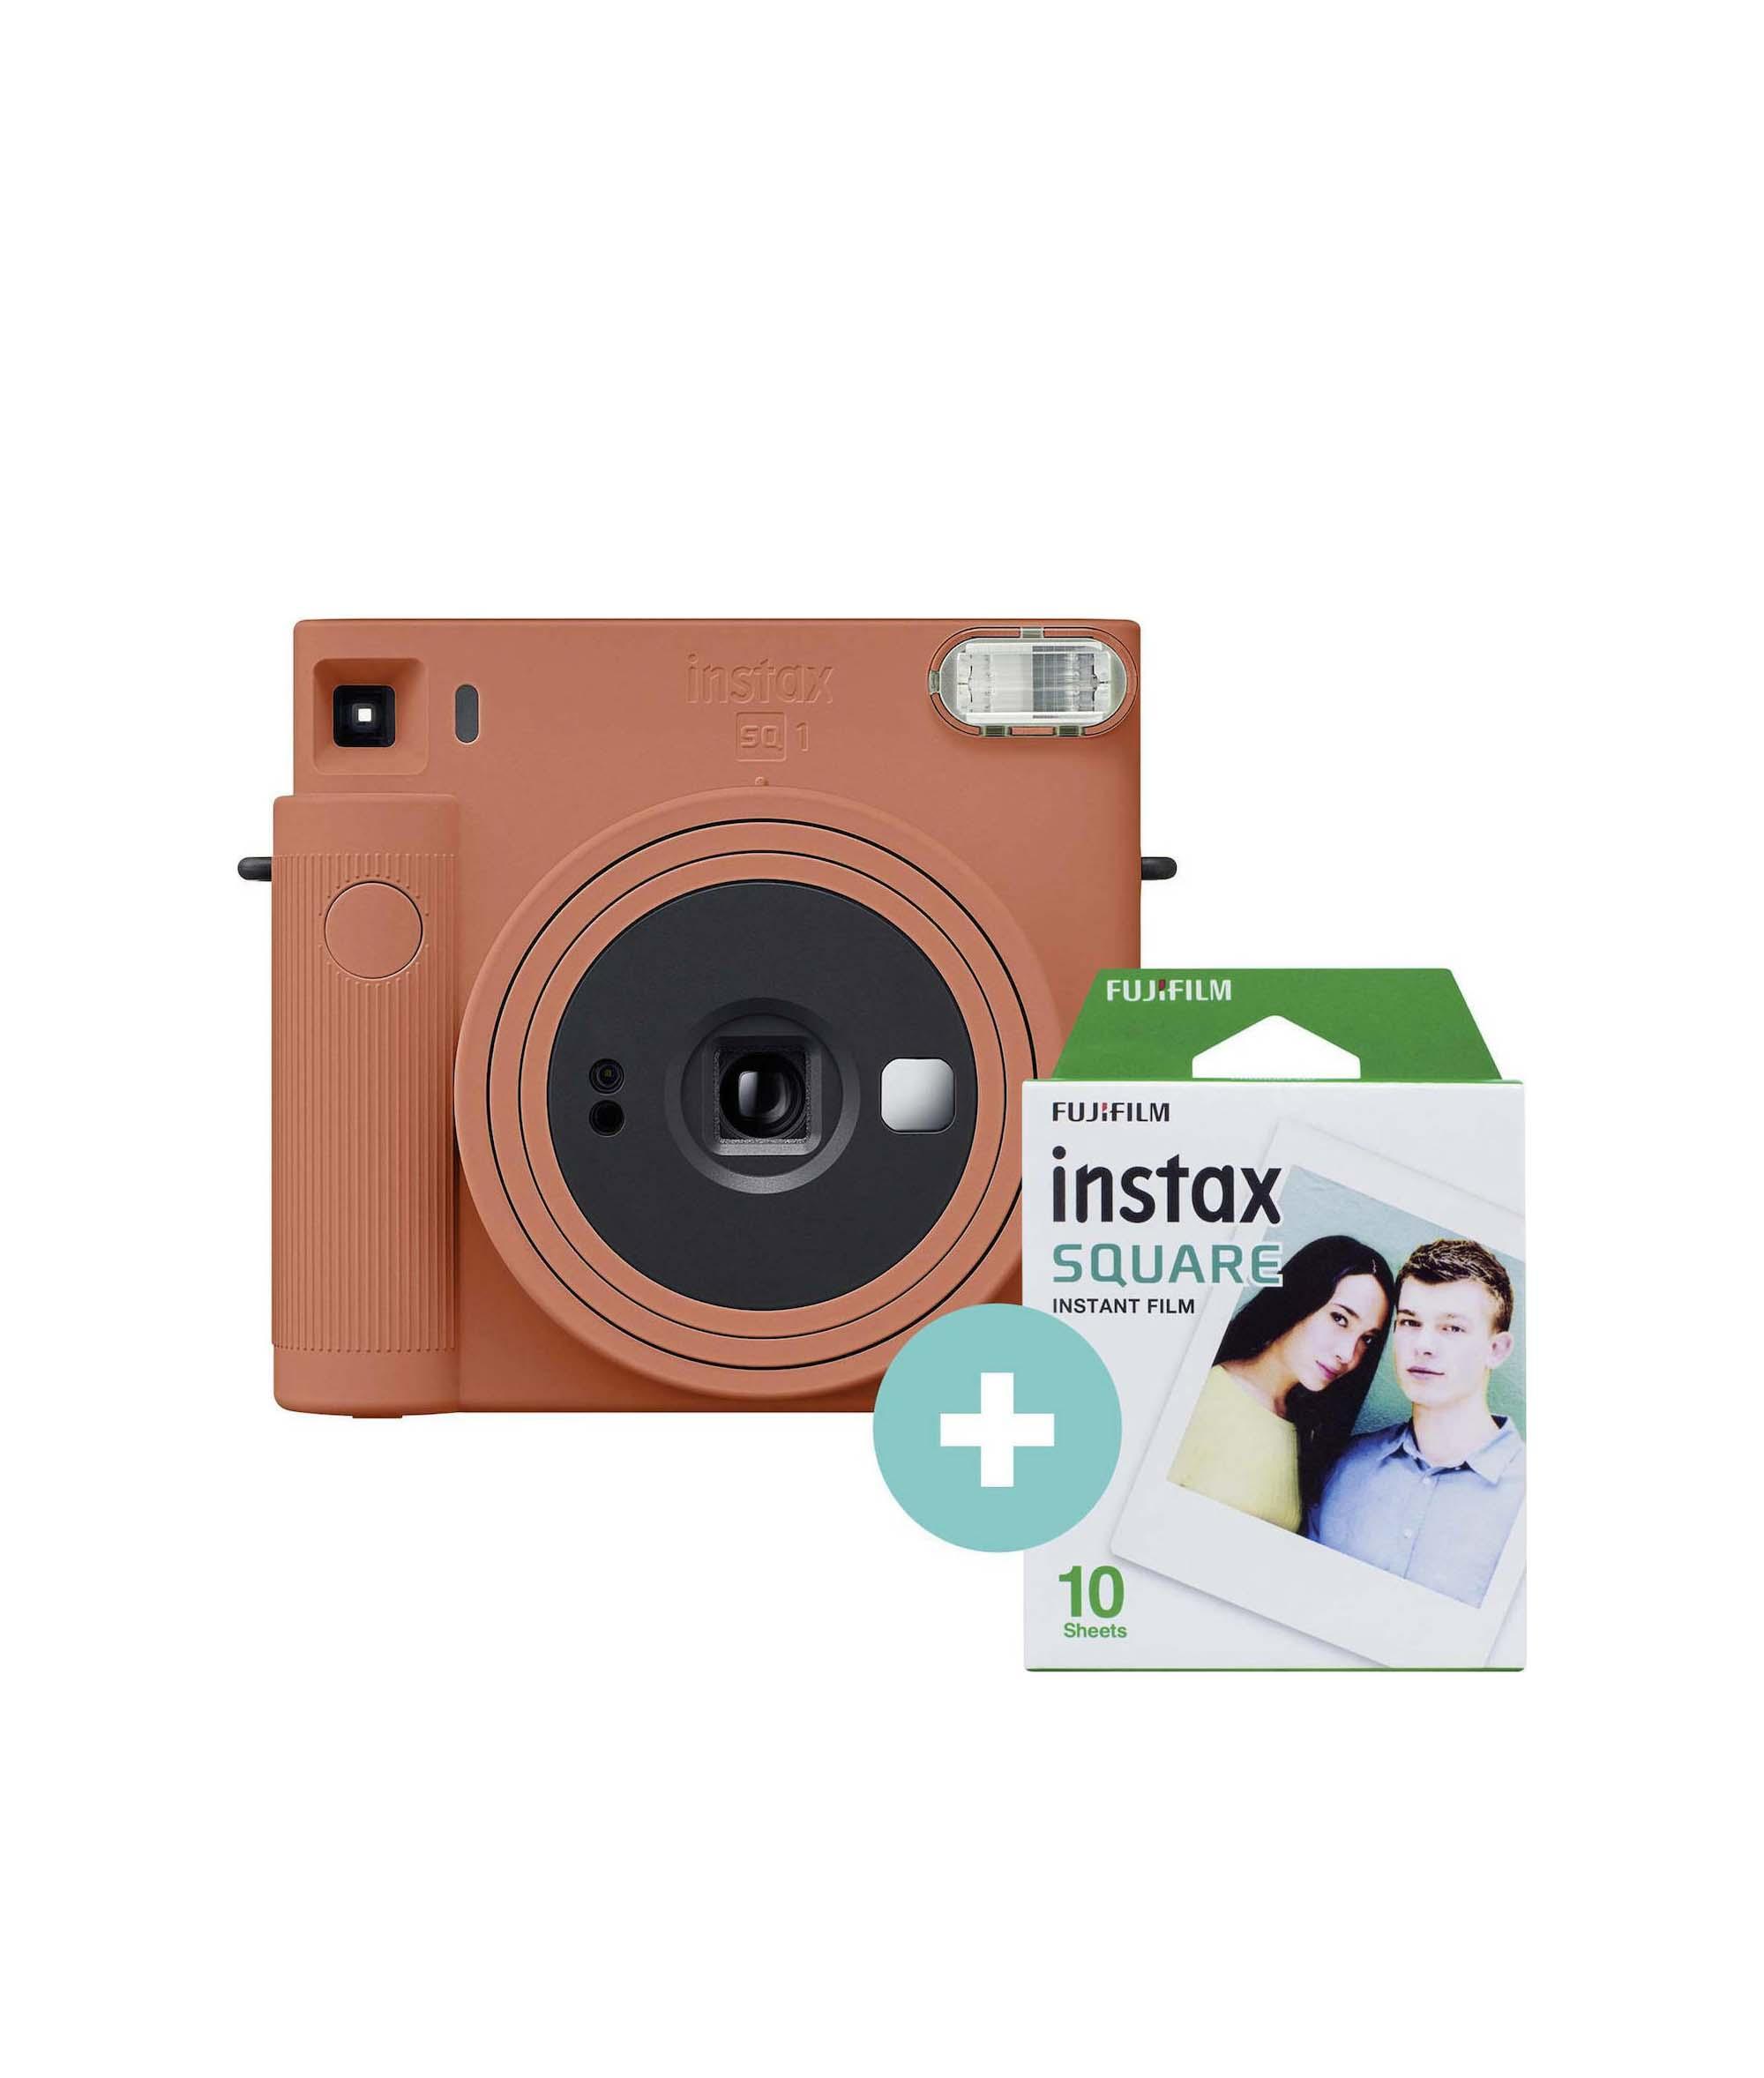 Fujifilm Instax Square SQ 1 Set Terracotta Orange Αναλογική Φωτογραφική Μηχανή 70100148679